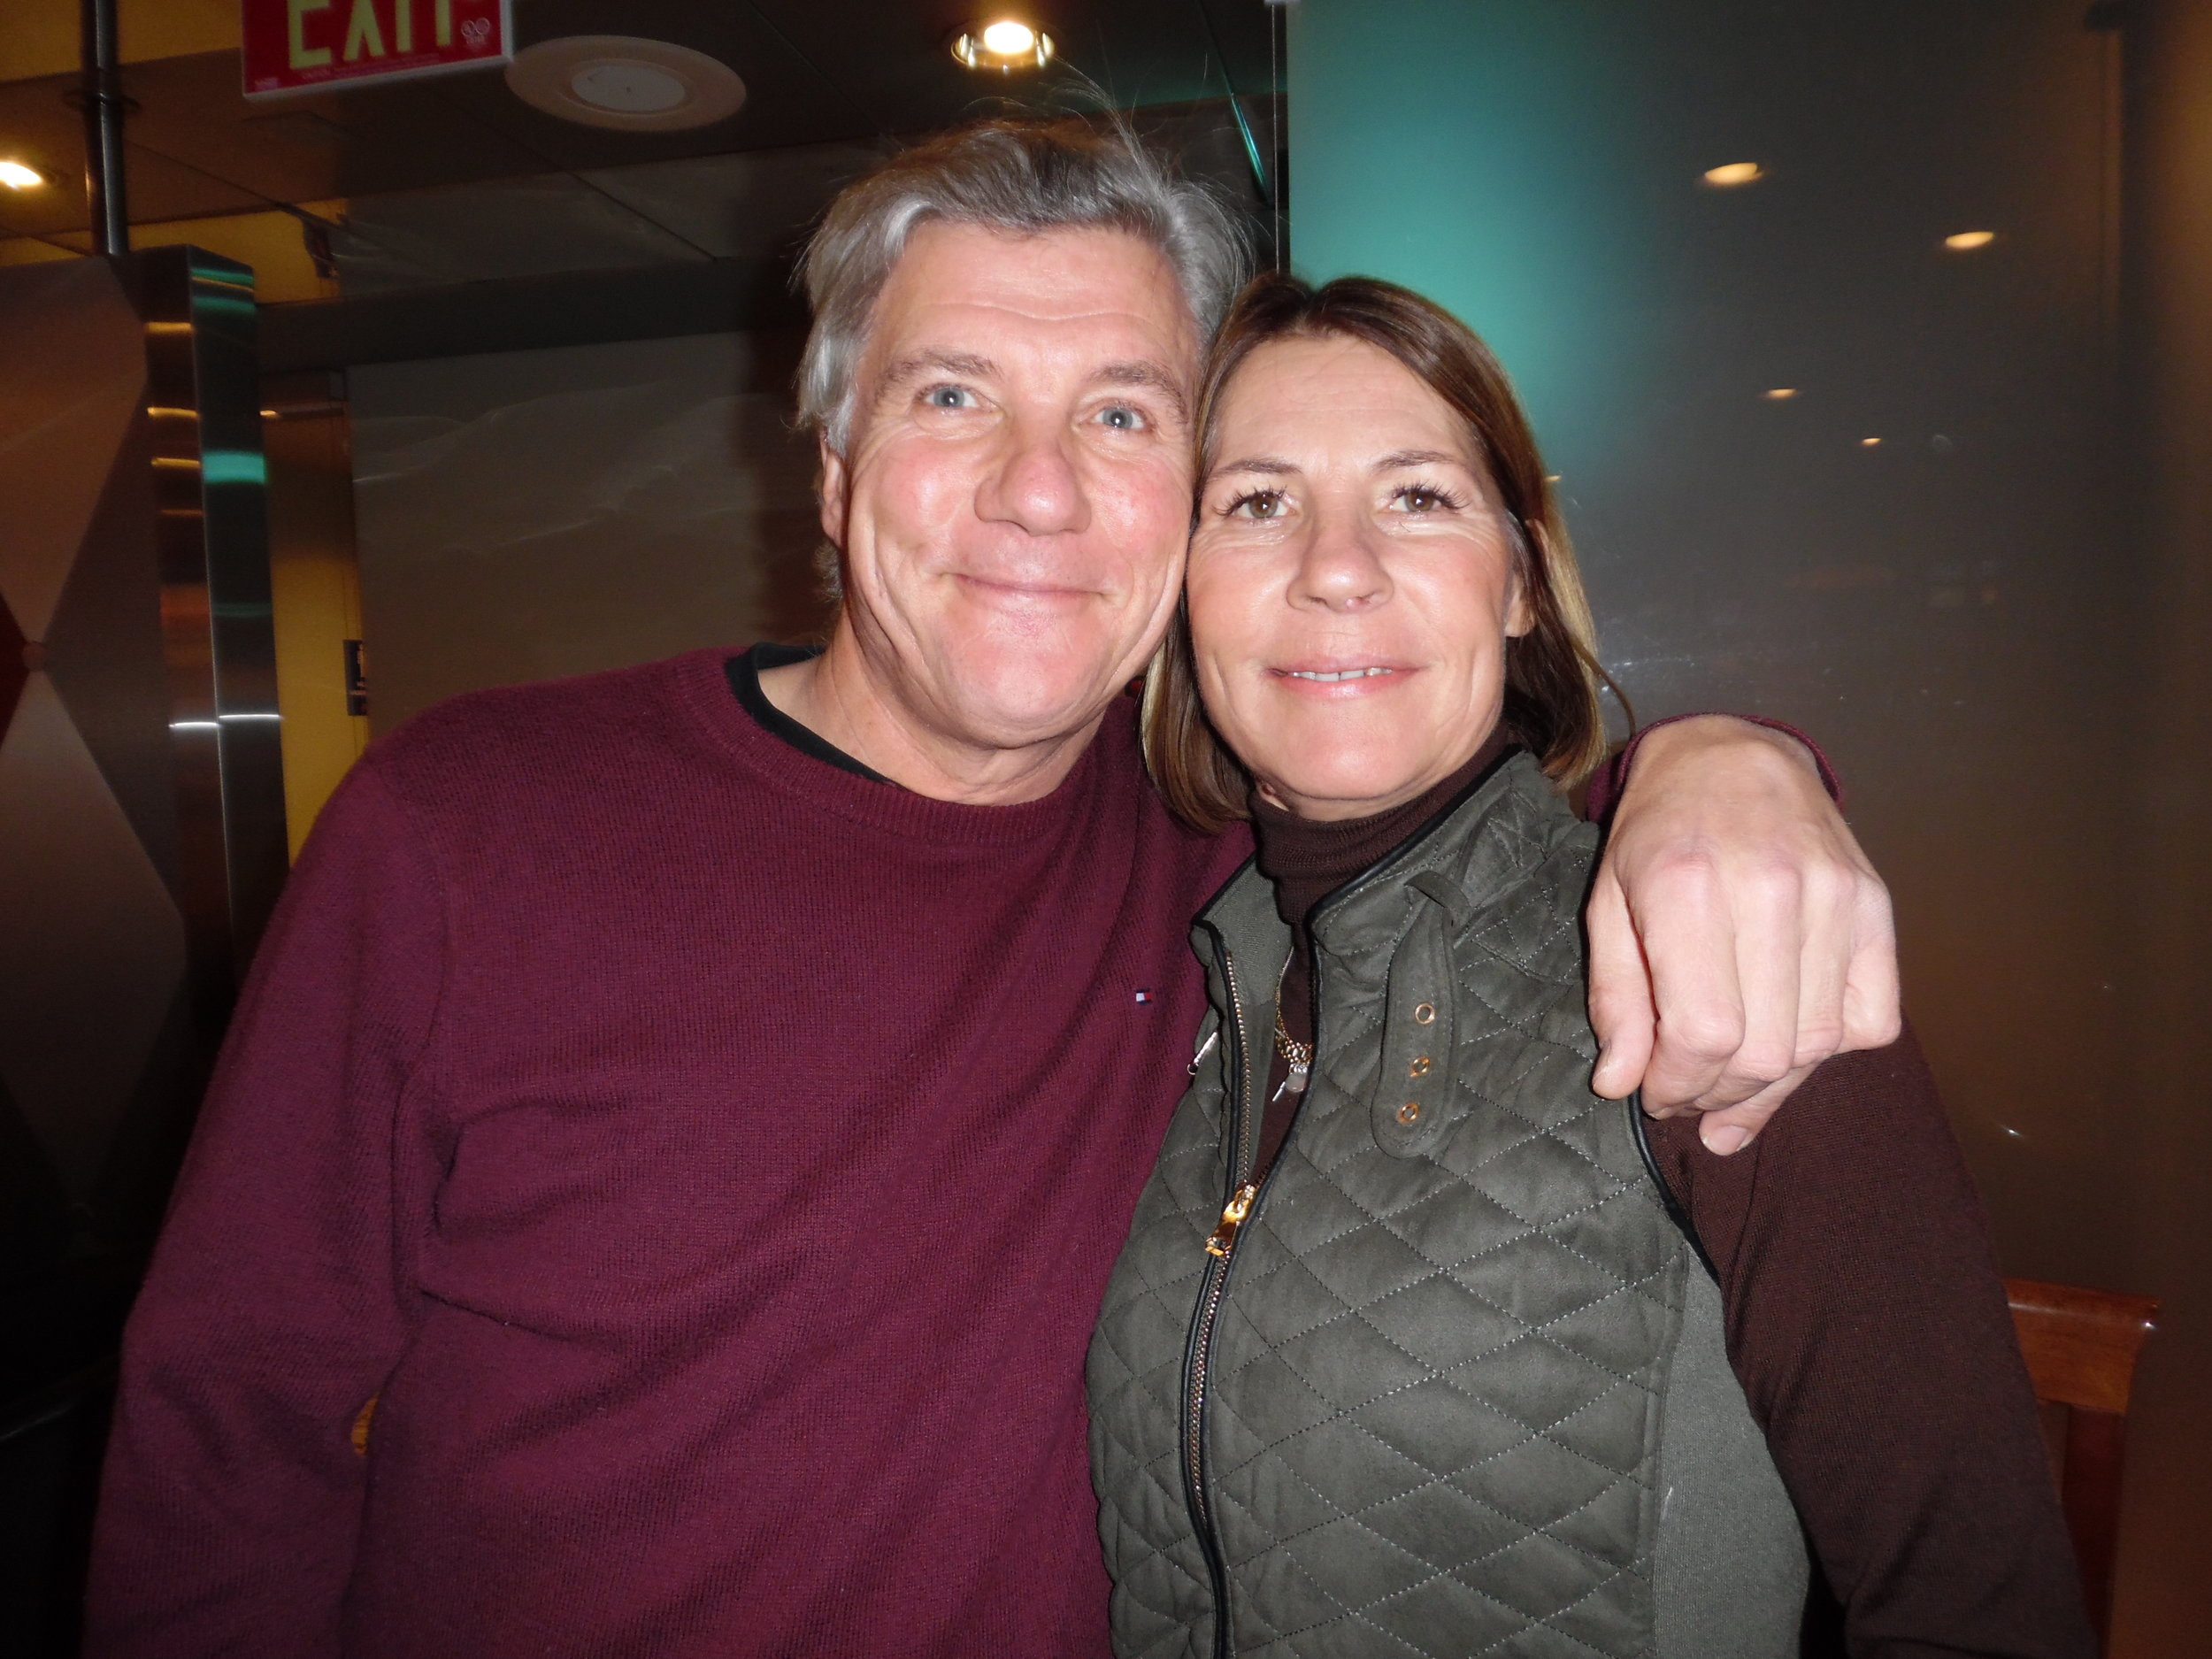 Freddie and his wife, Chris, enjoyed dancing at ETA  Matt Cage 's Mohawk Raceway show.